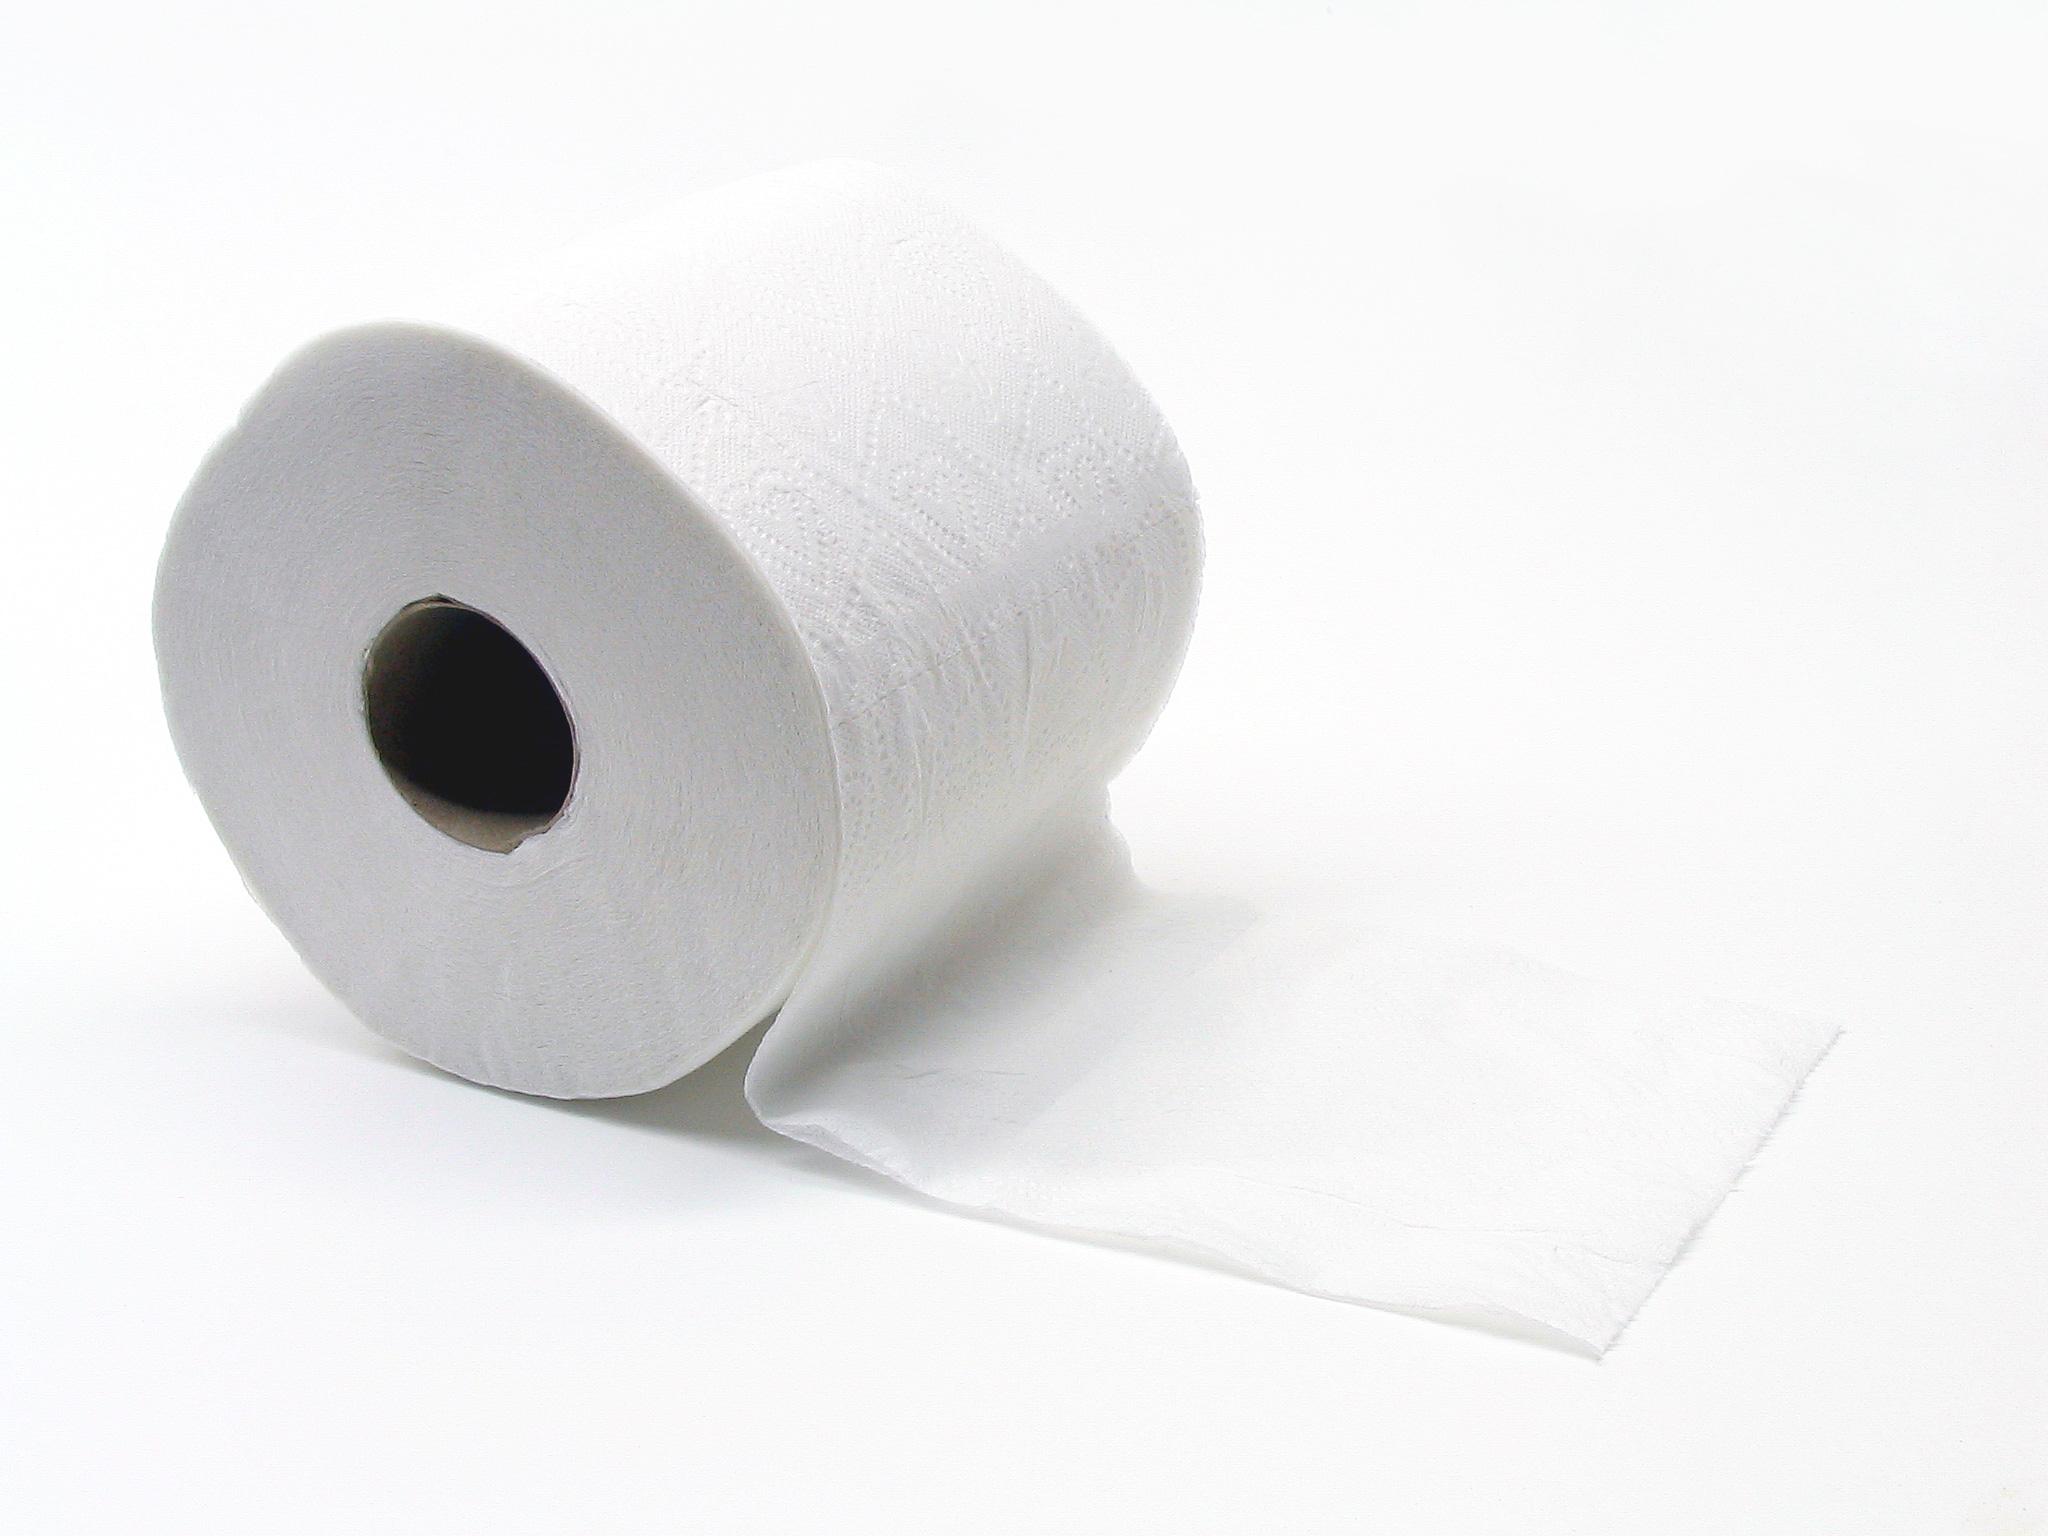 Toiletpapier_(Gobran111).jpg